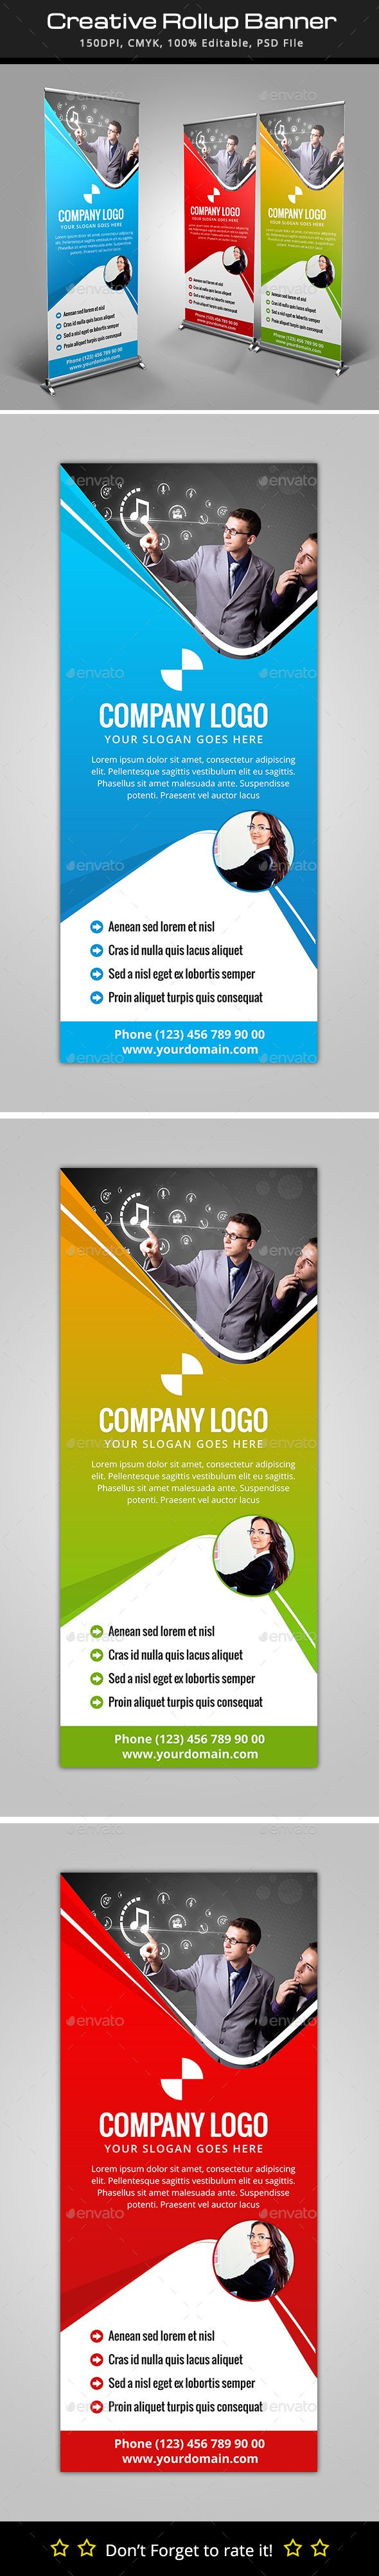 Design banner template - Creative Roll Up Banner